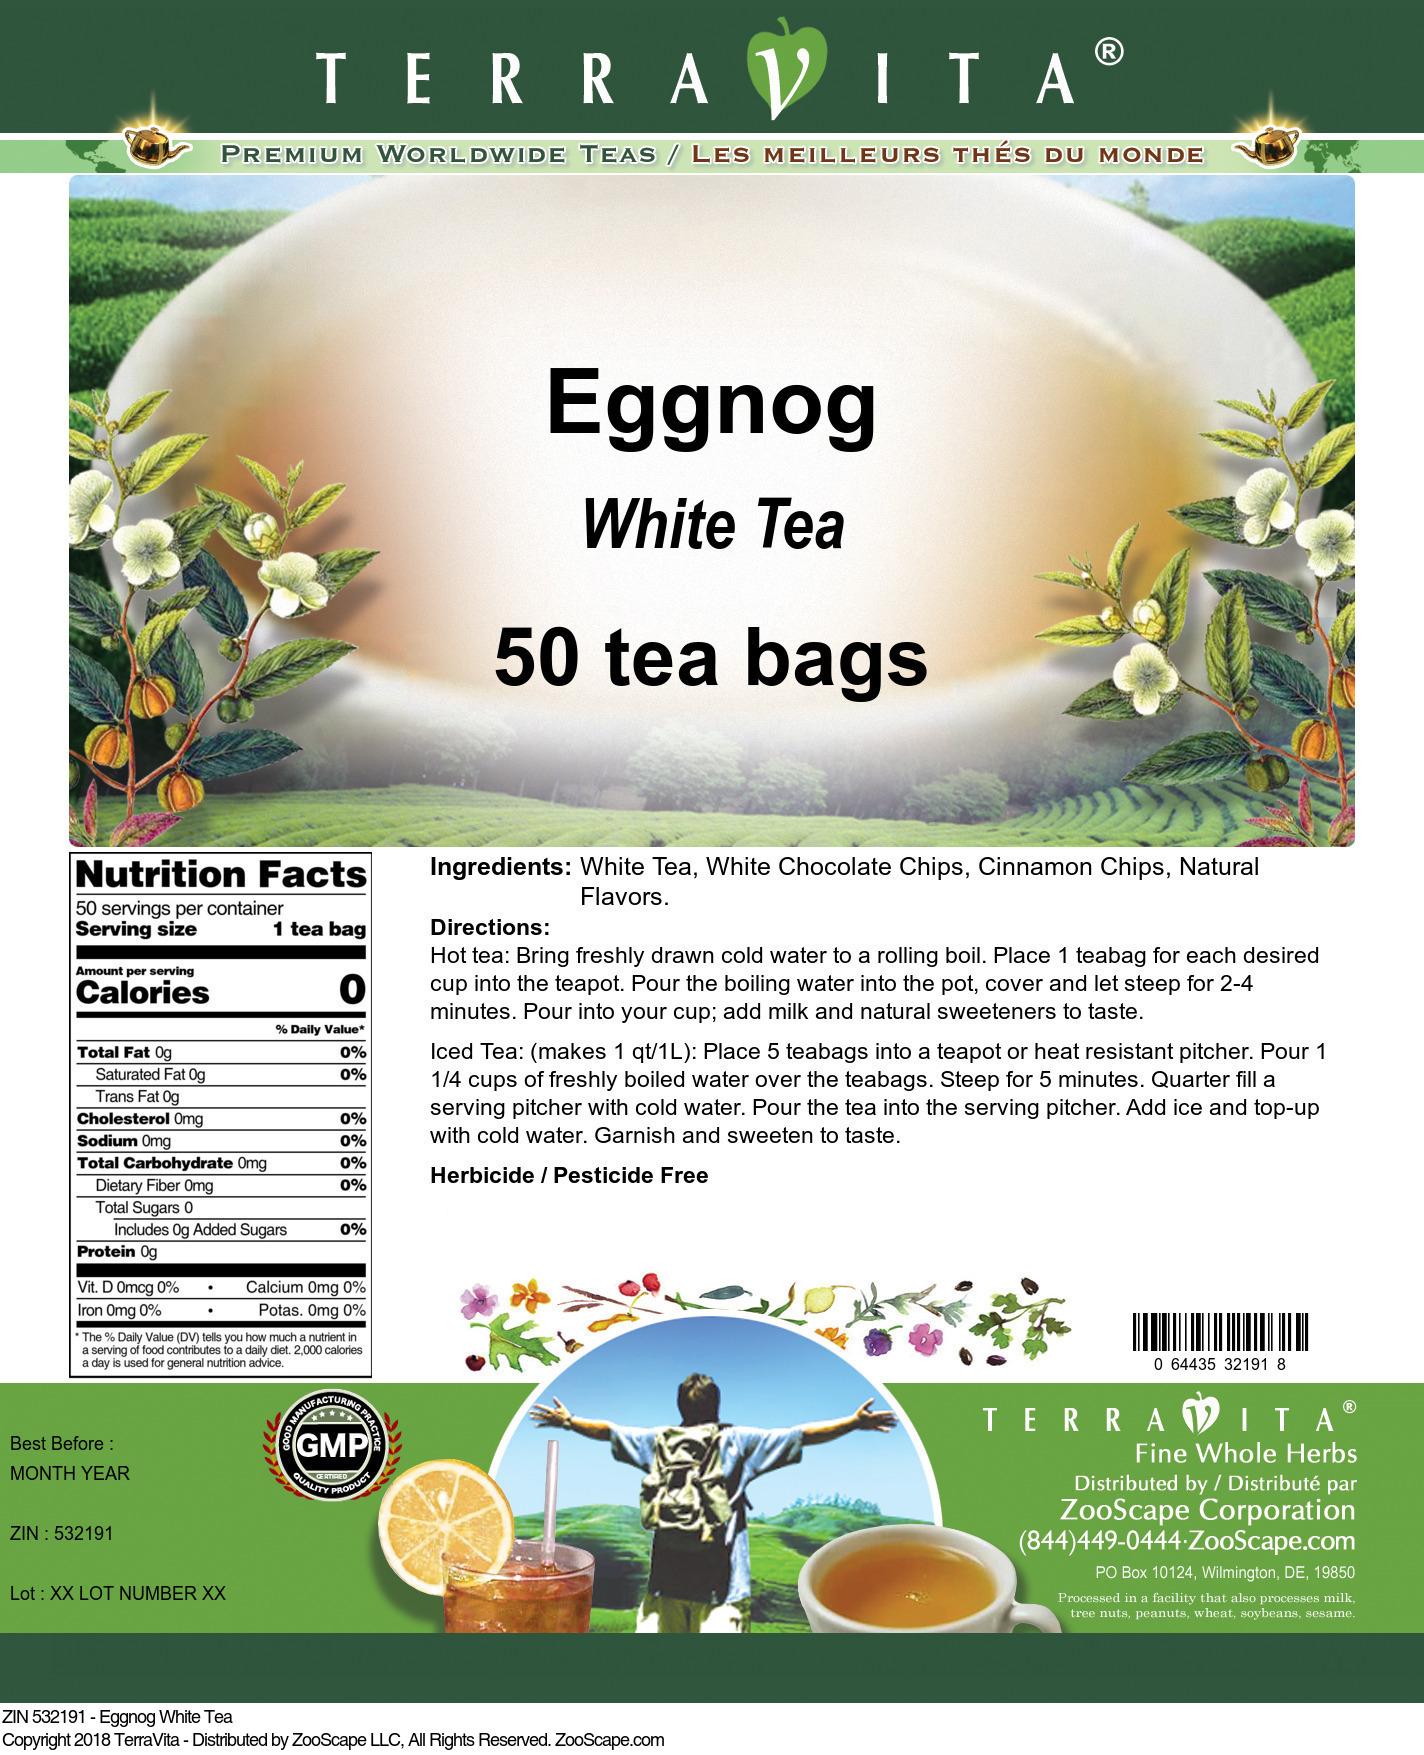 Eggnog White Tea